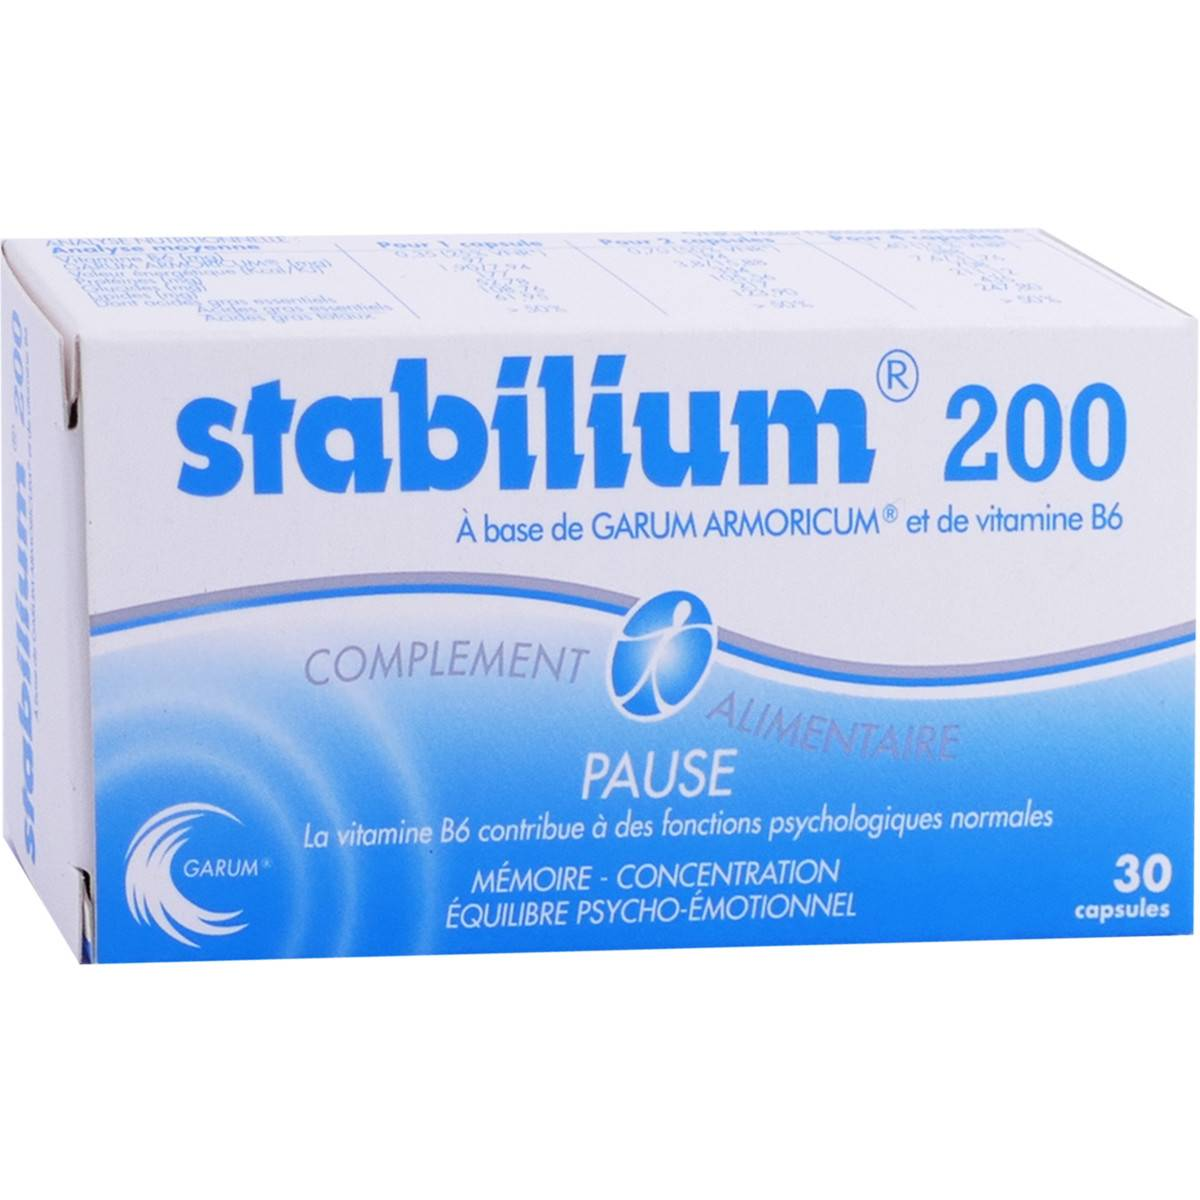 YALACTA Stabilium 200 pause 30 capsules mÉmoire